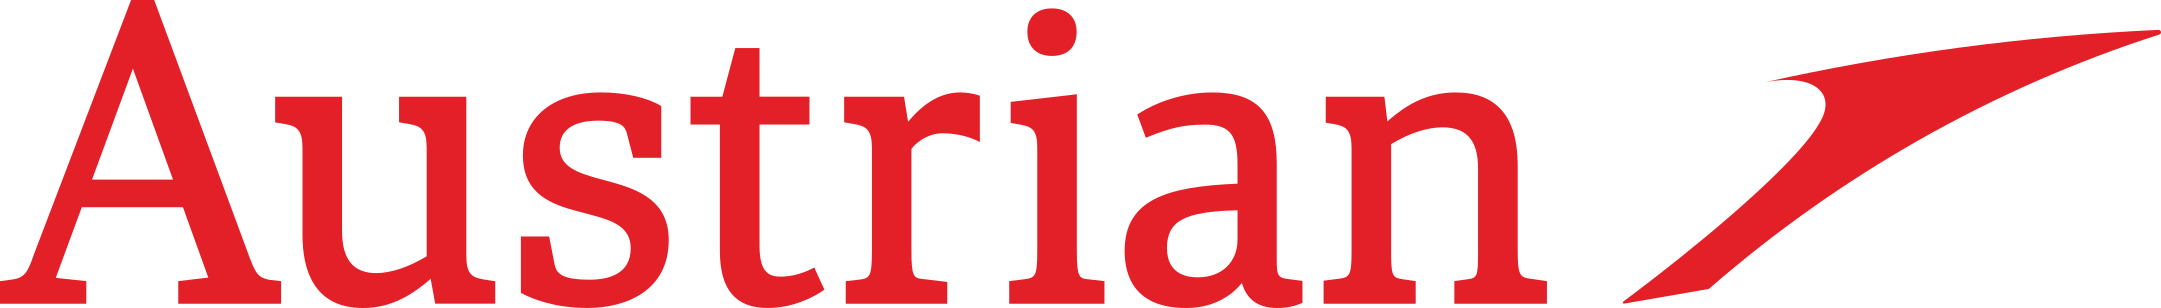 austrian airlines logo 1 - Austrian Airlines Logo